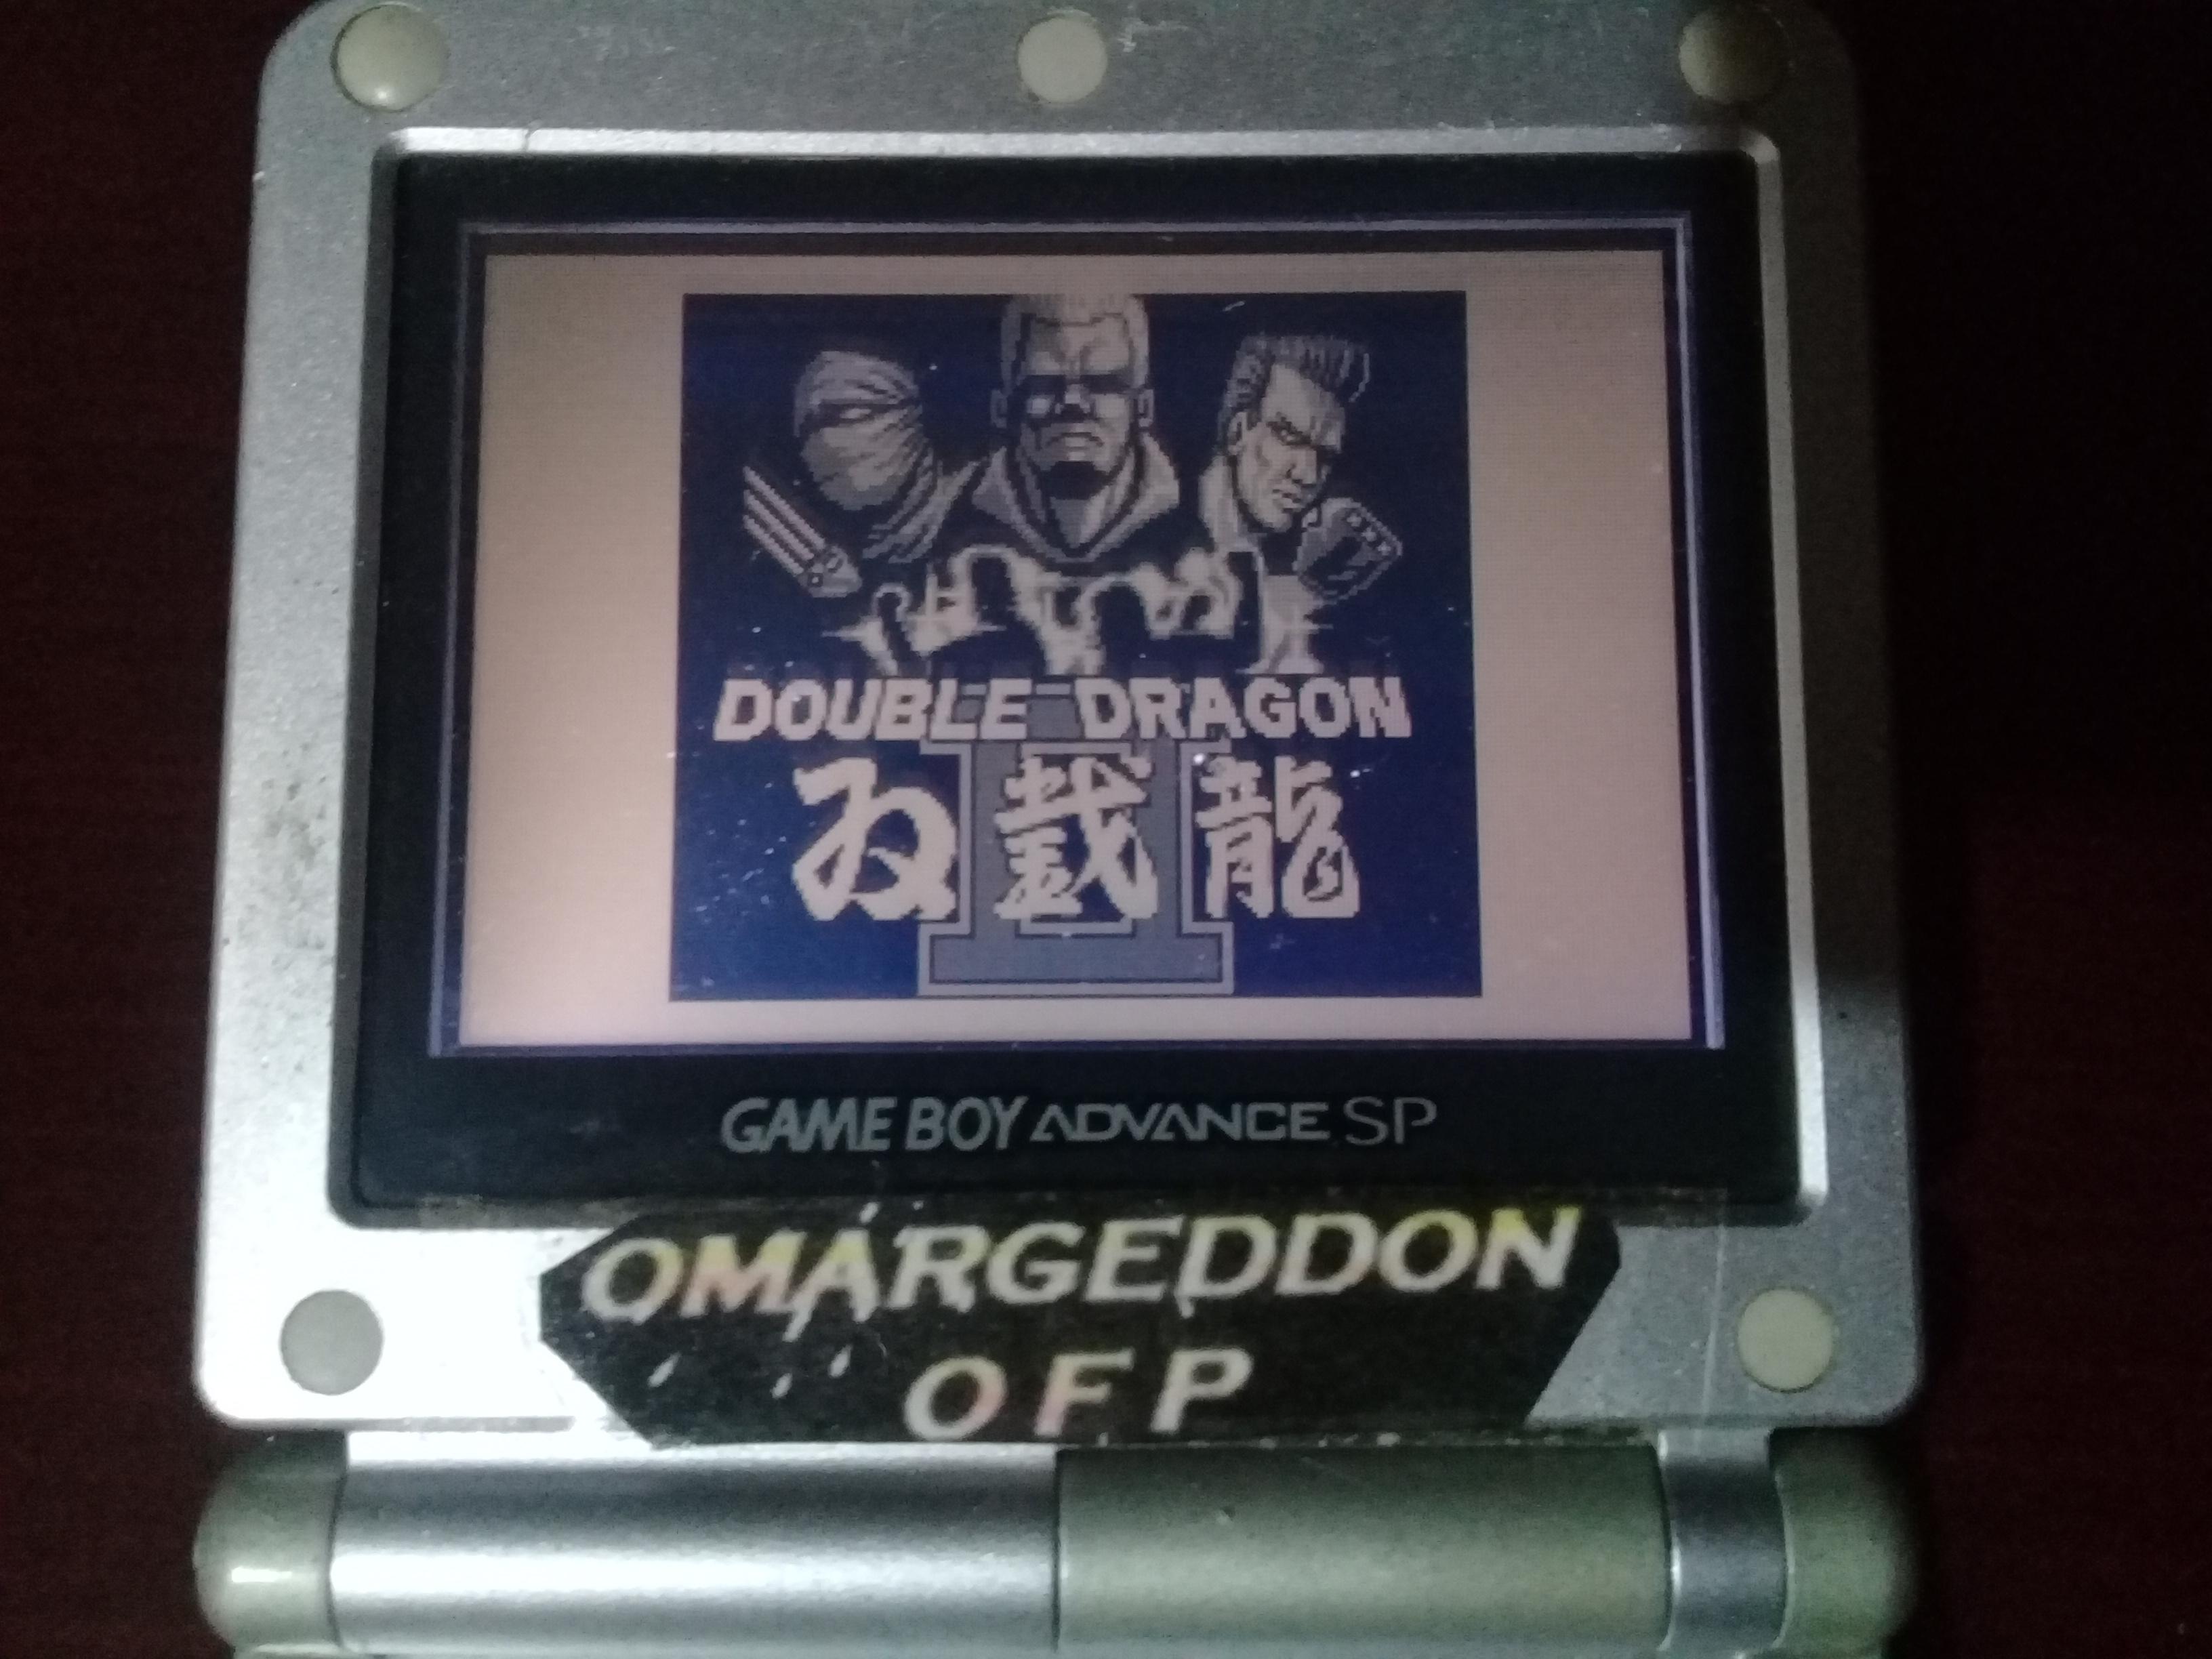 omargeddon: Double Dragon II (Game Boy) 106,900 points on 2019-01-12 01:28:27